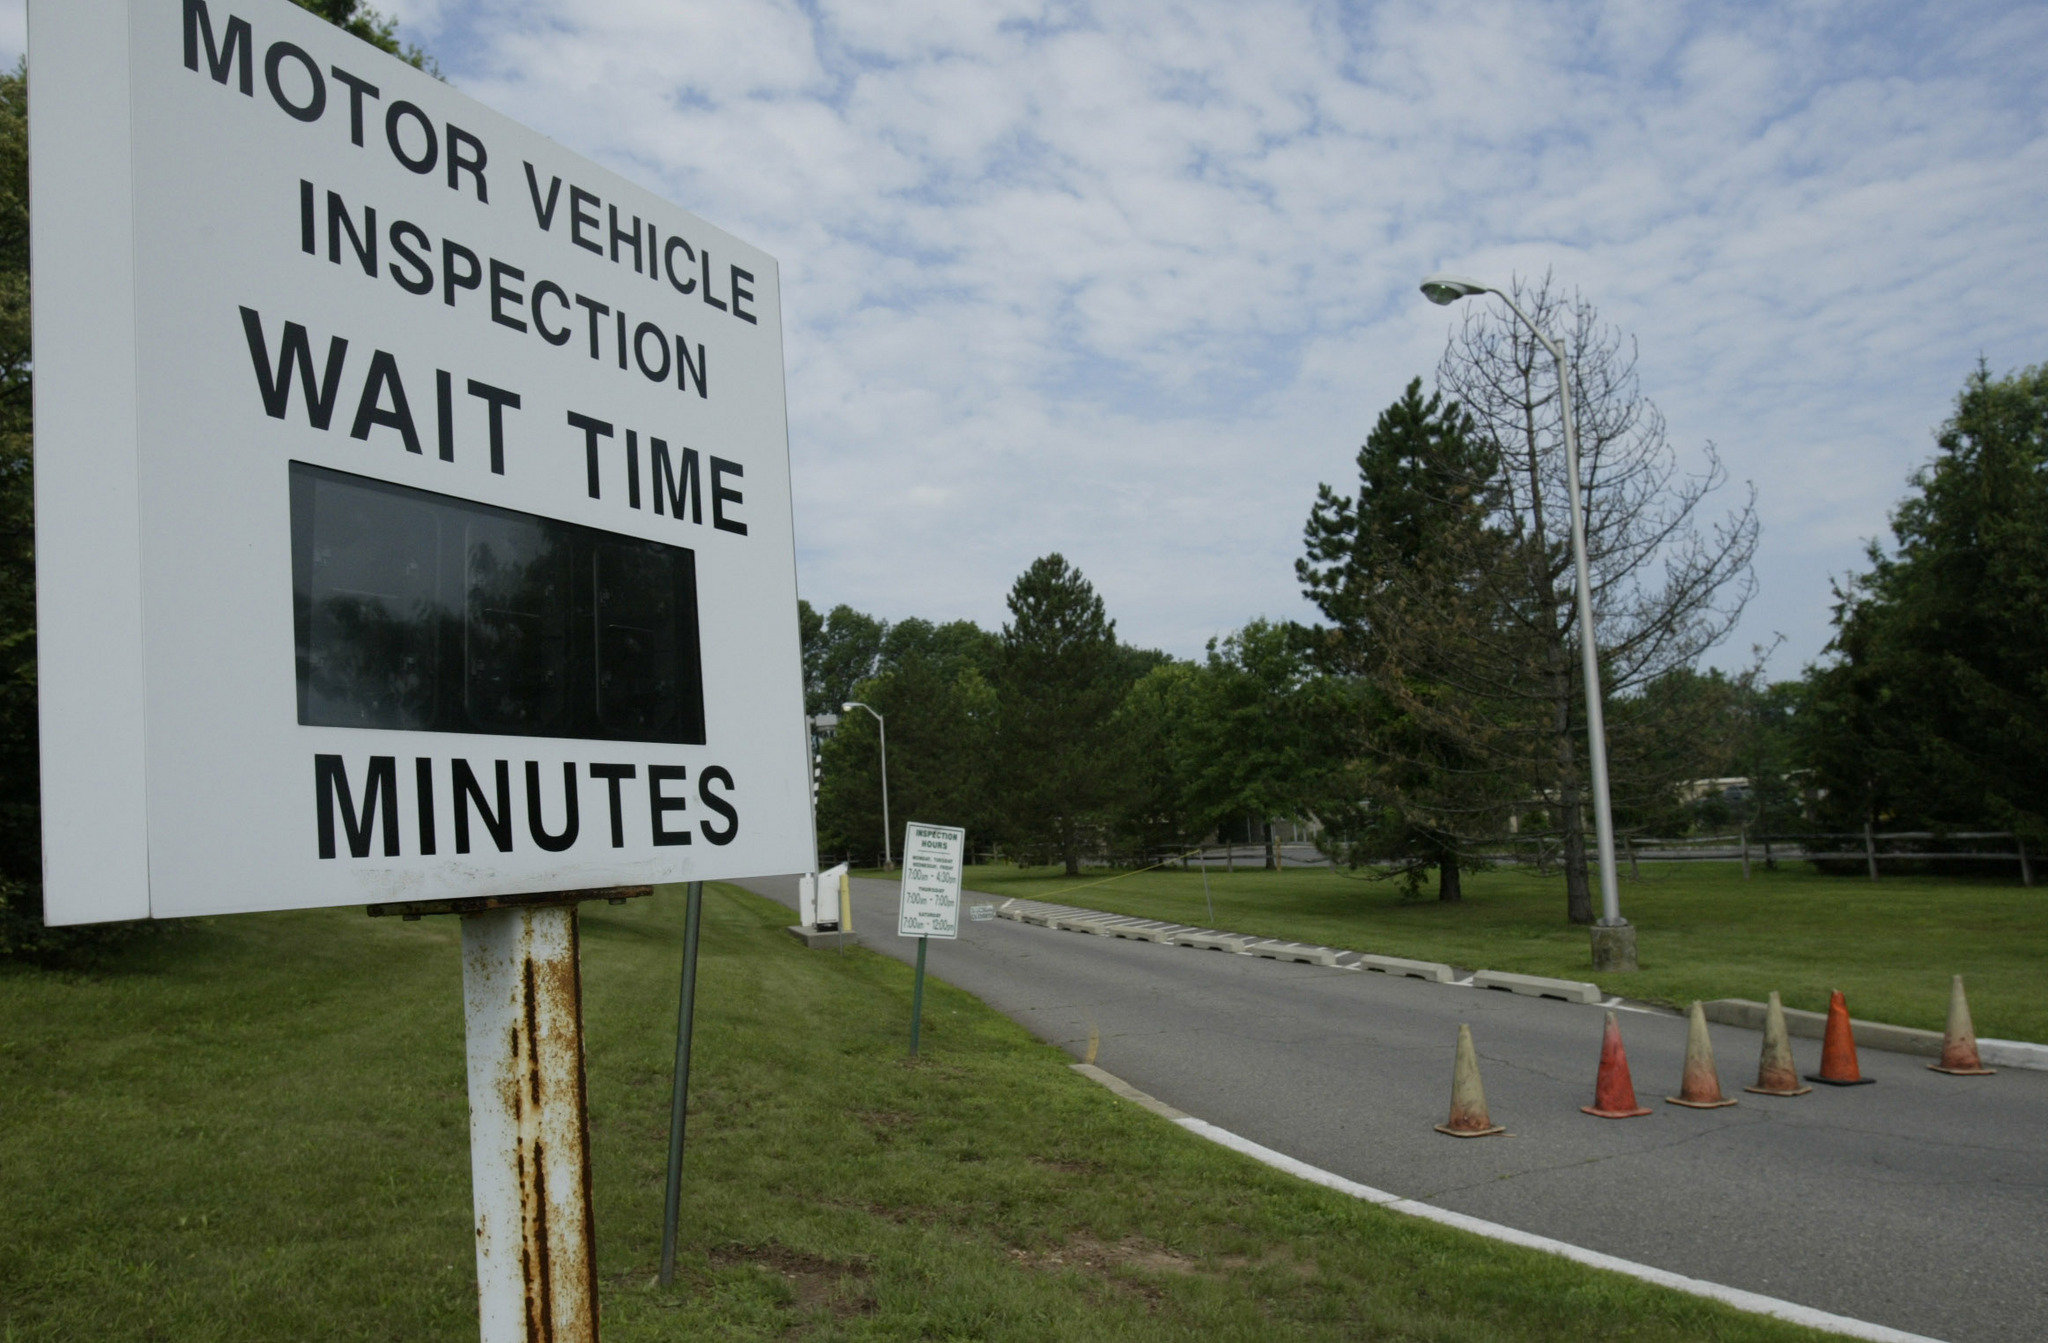 Nj motor vehicle address change for Motor vehicle inspection station ancora nj hours